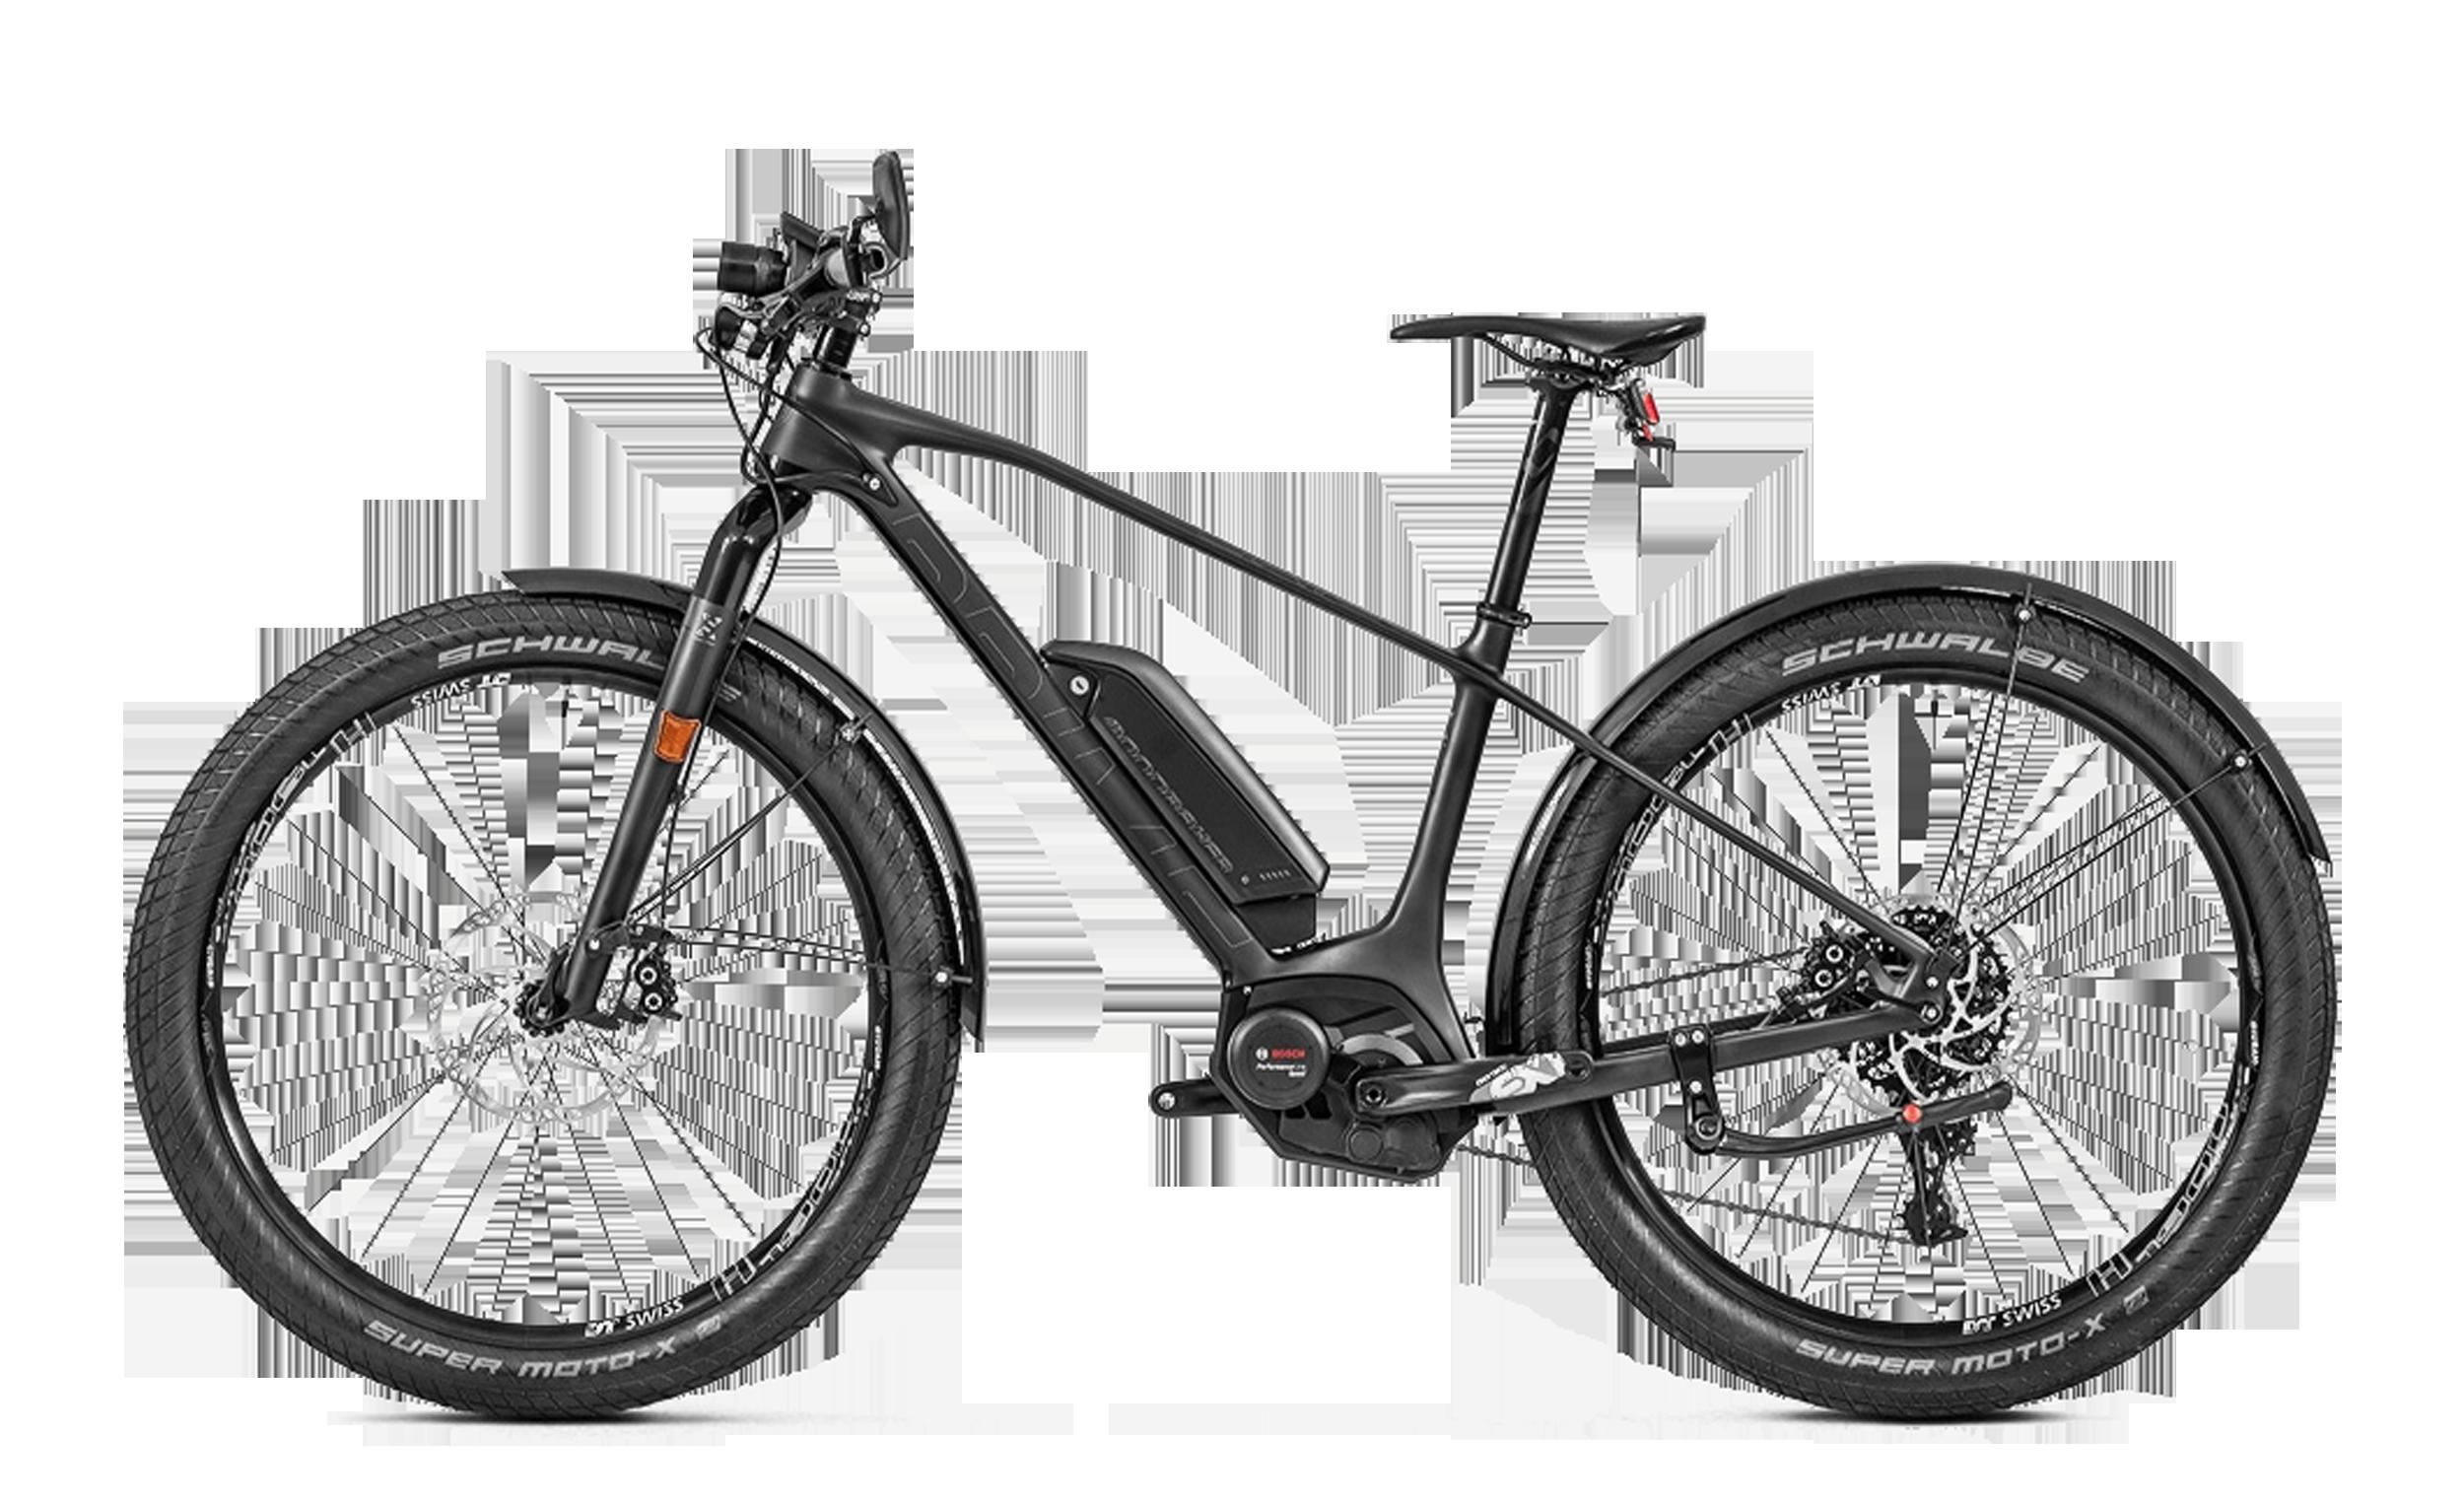 https://w8w5m3f8.stackpathcdn.com/17809/vtt-electrique-speedbike-prime-carbon-noir-sx-45kmh-500wh-275.jpg